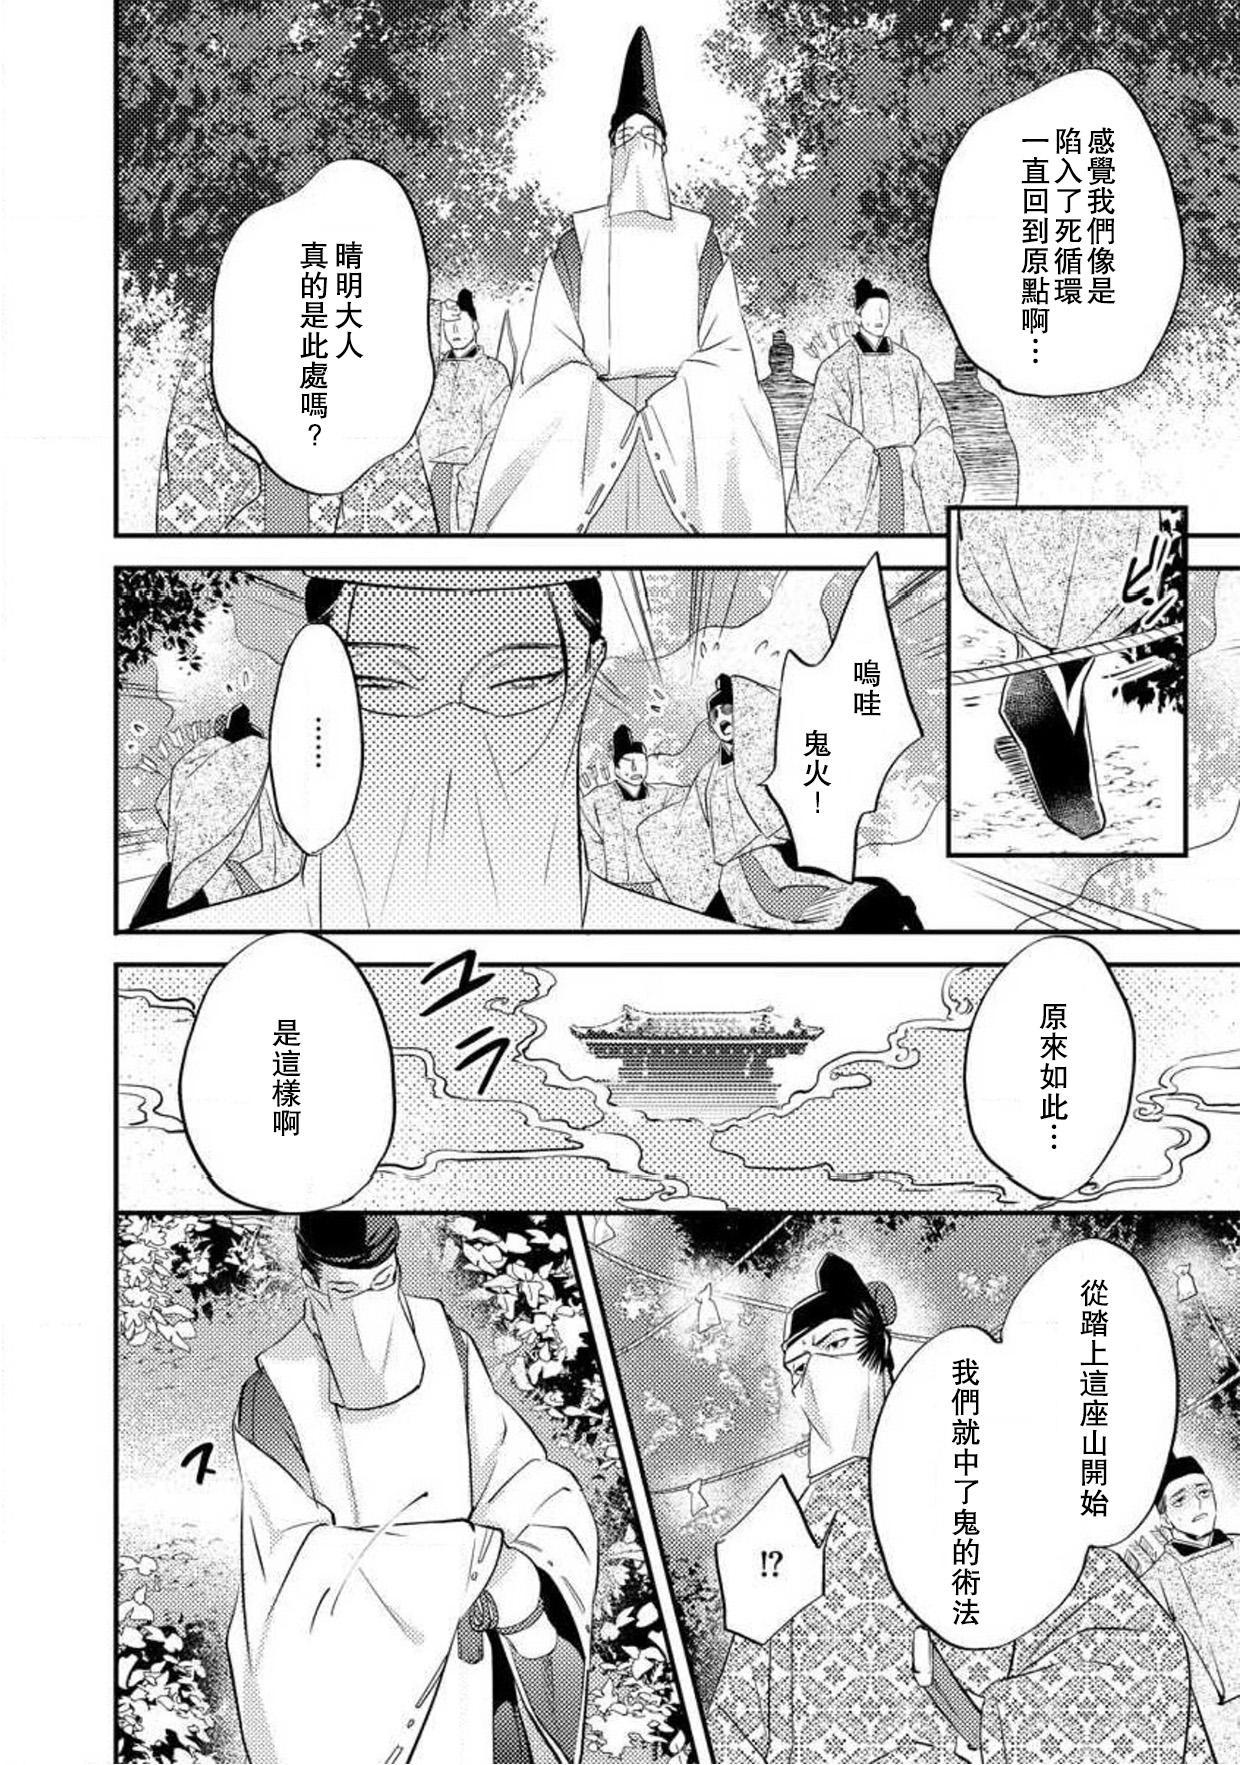 Oeyama suimutan utsukushiki oni no toraware hime | 大江山醉夢逸話 美麗的鬼與被囚禁的公主 Ch. 1-8 203